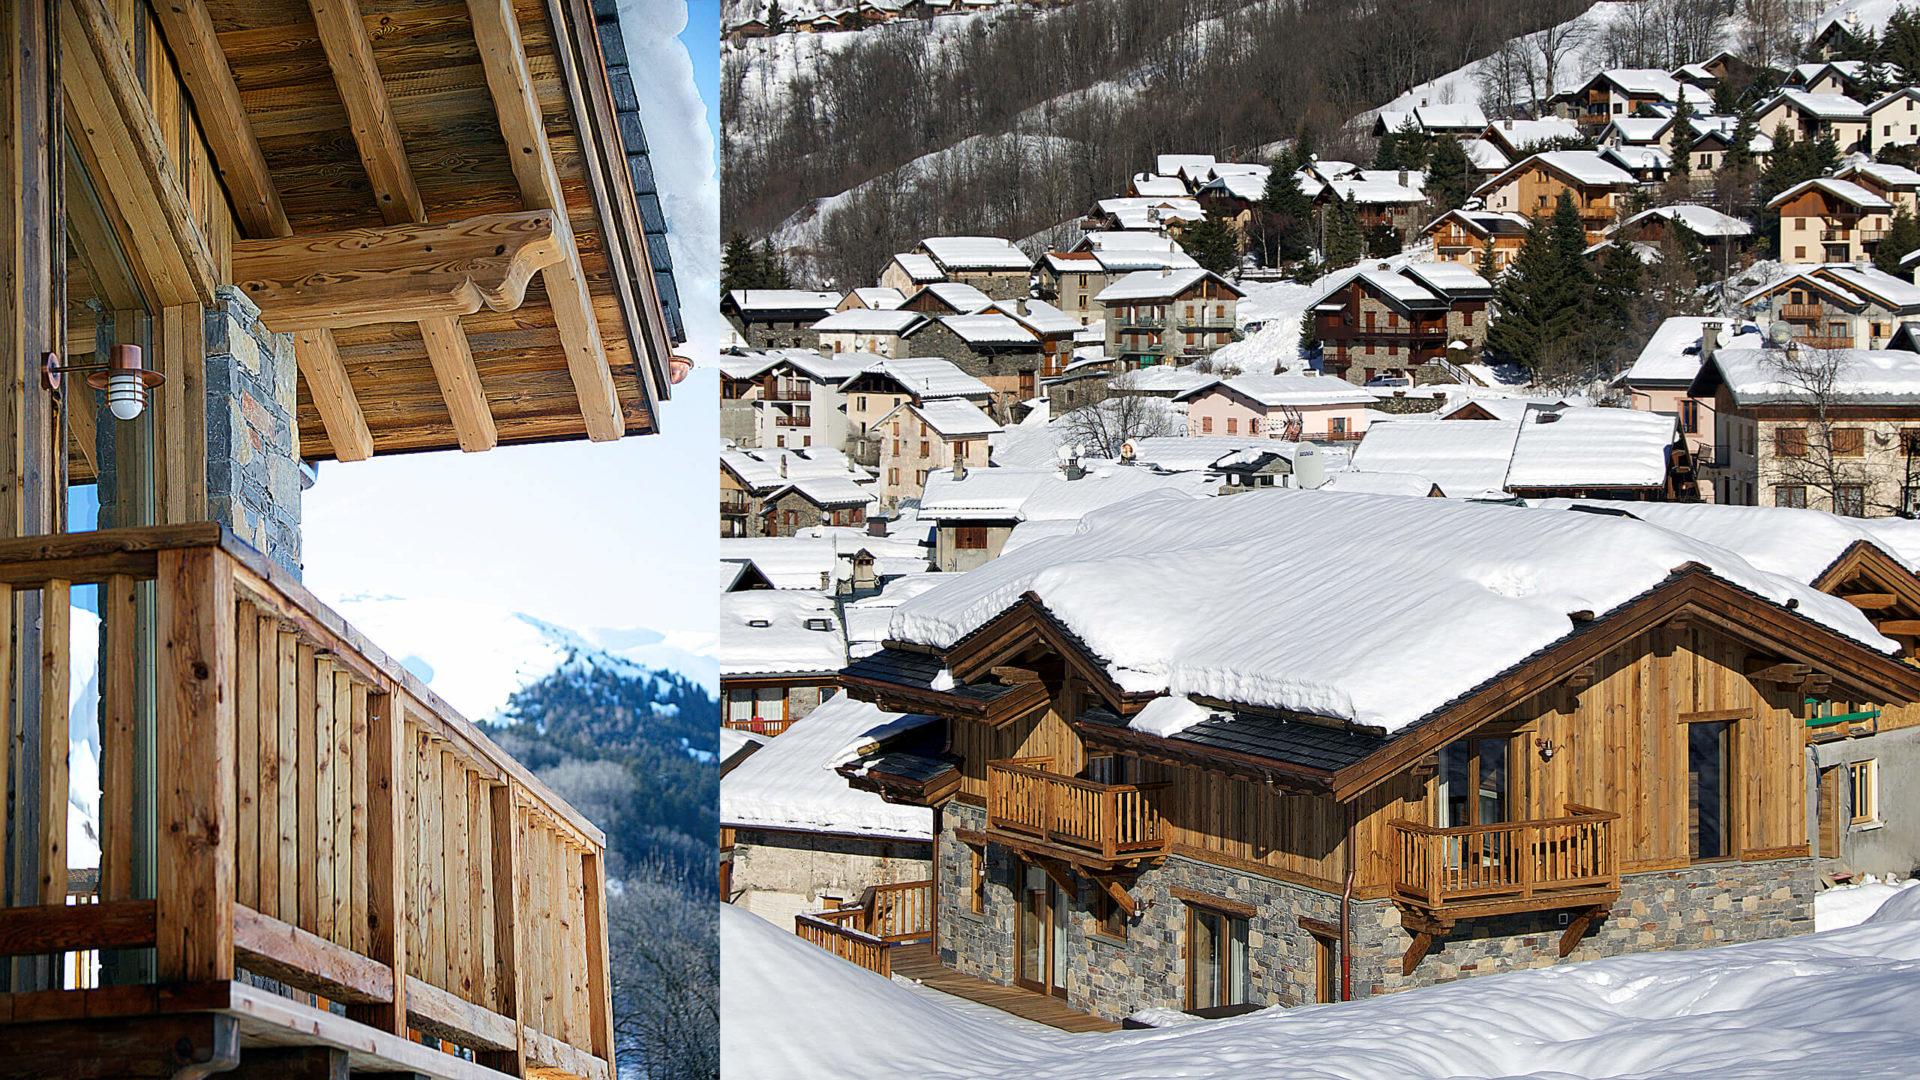 Chalet Mehrotra Vue 4 - Saint Martin de Belleville, Savoie